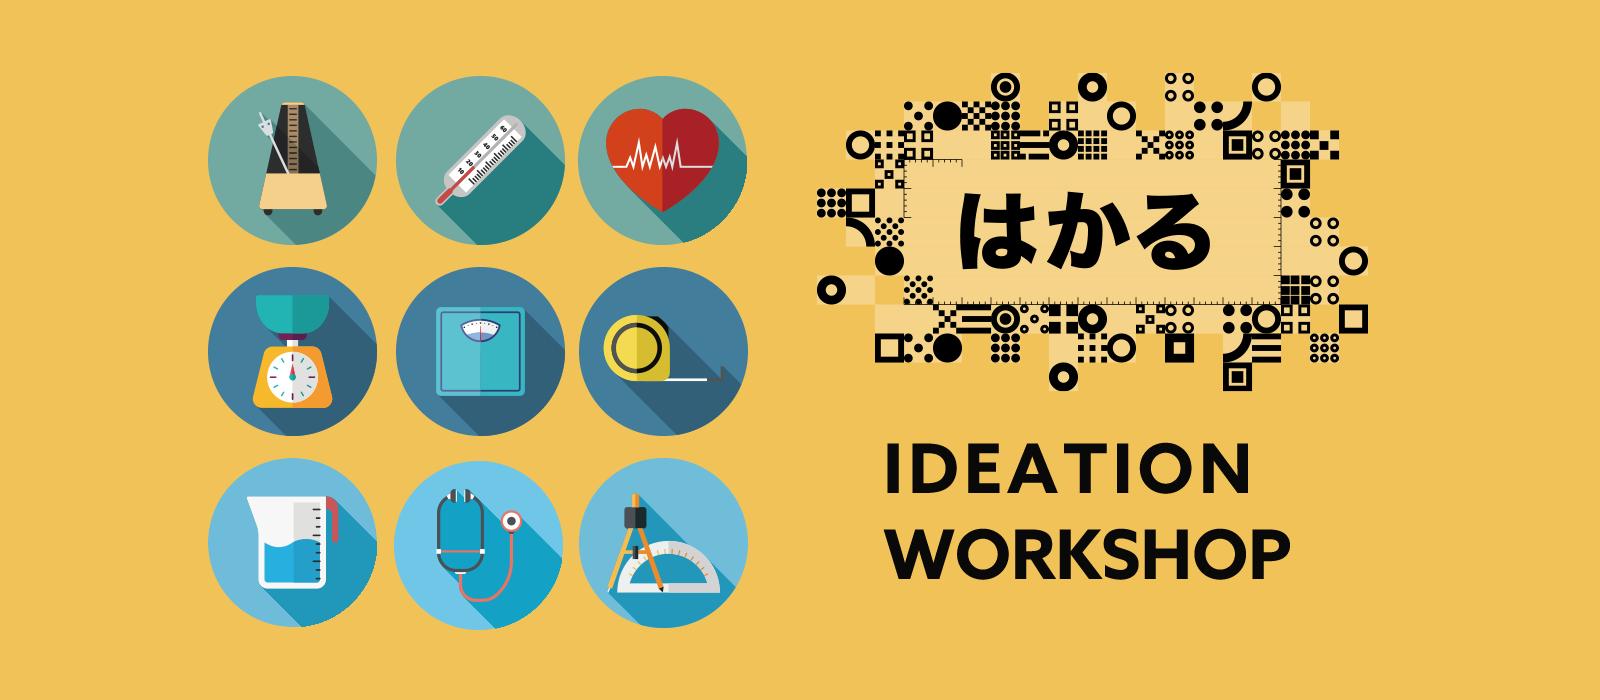 160828_hakaru-idea-workshop1600x700